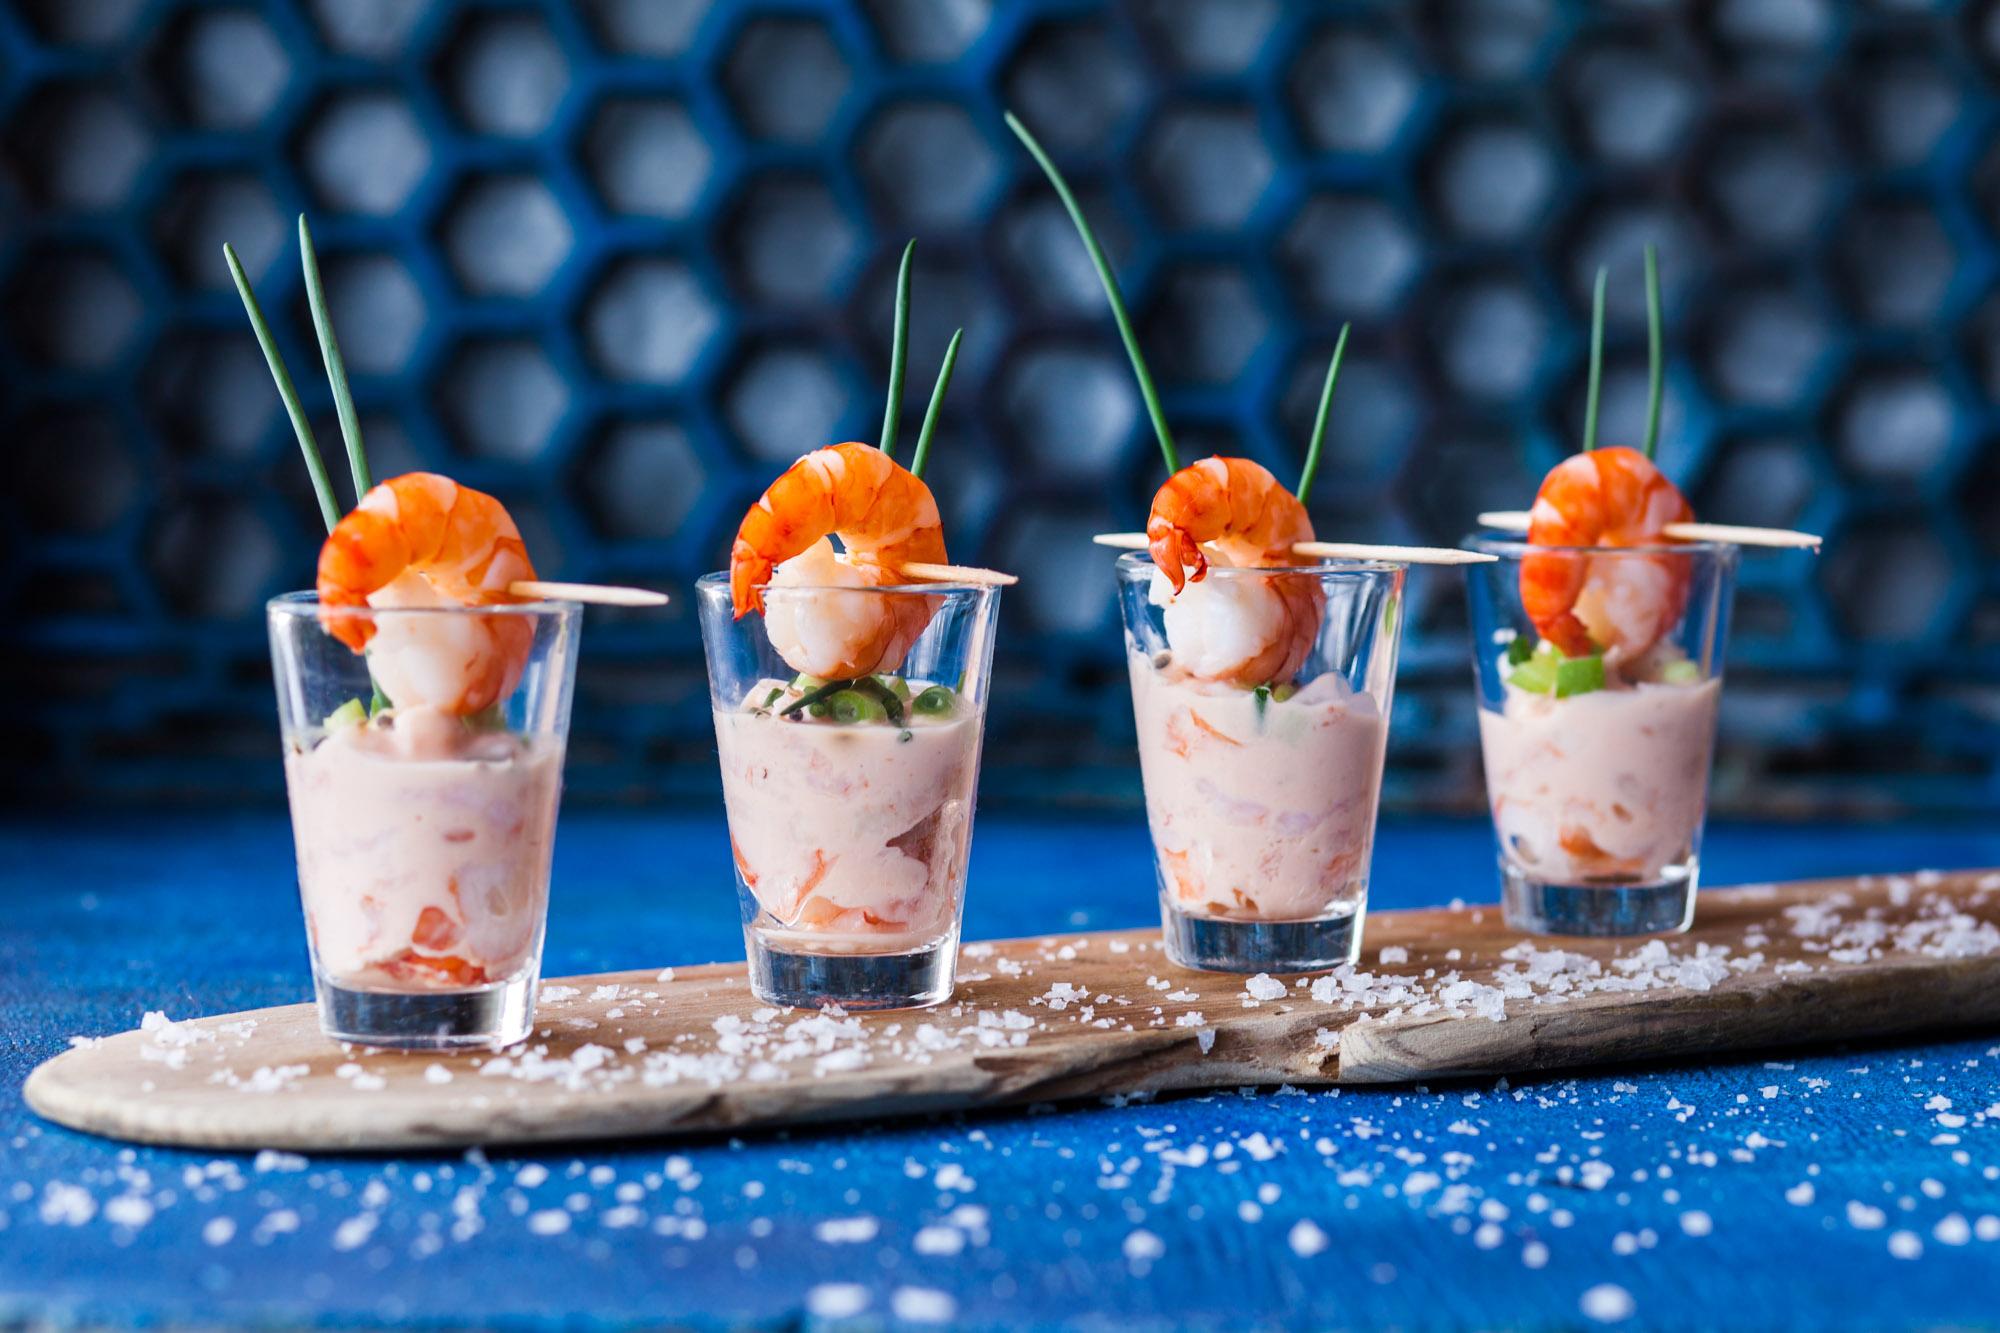 Prawn cocktail, Dorset- Food photographer